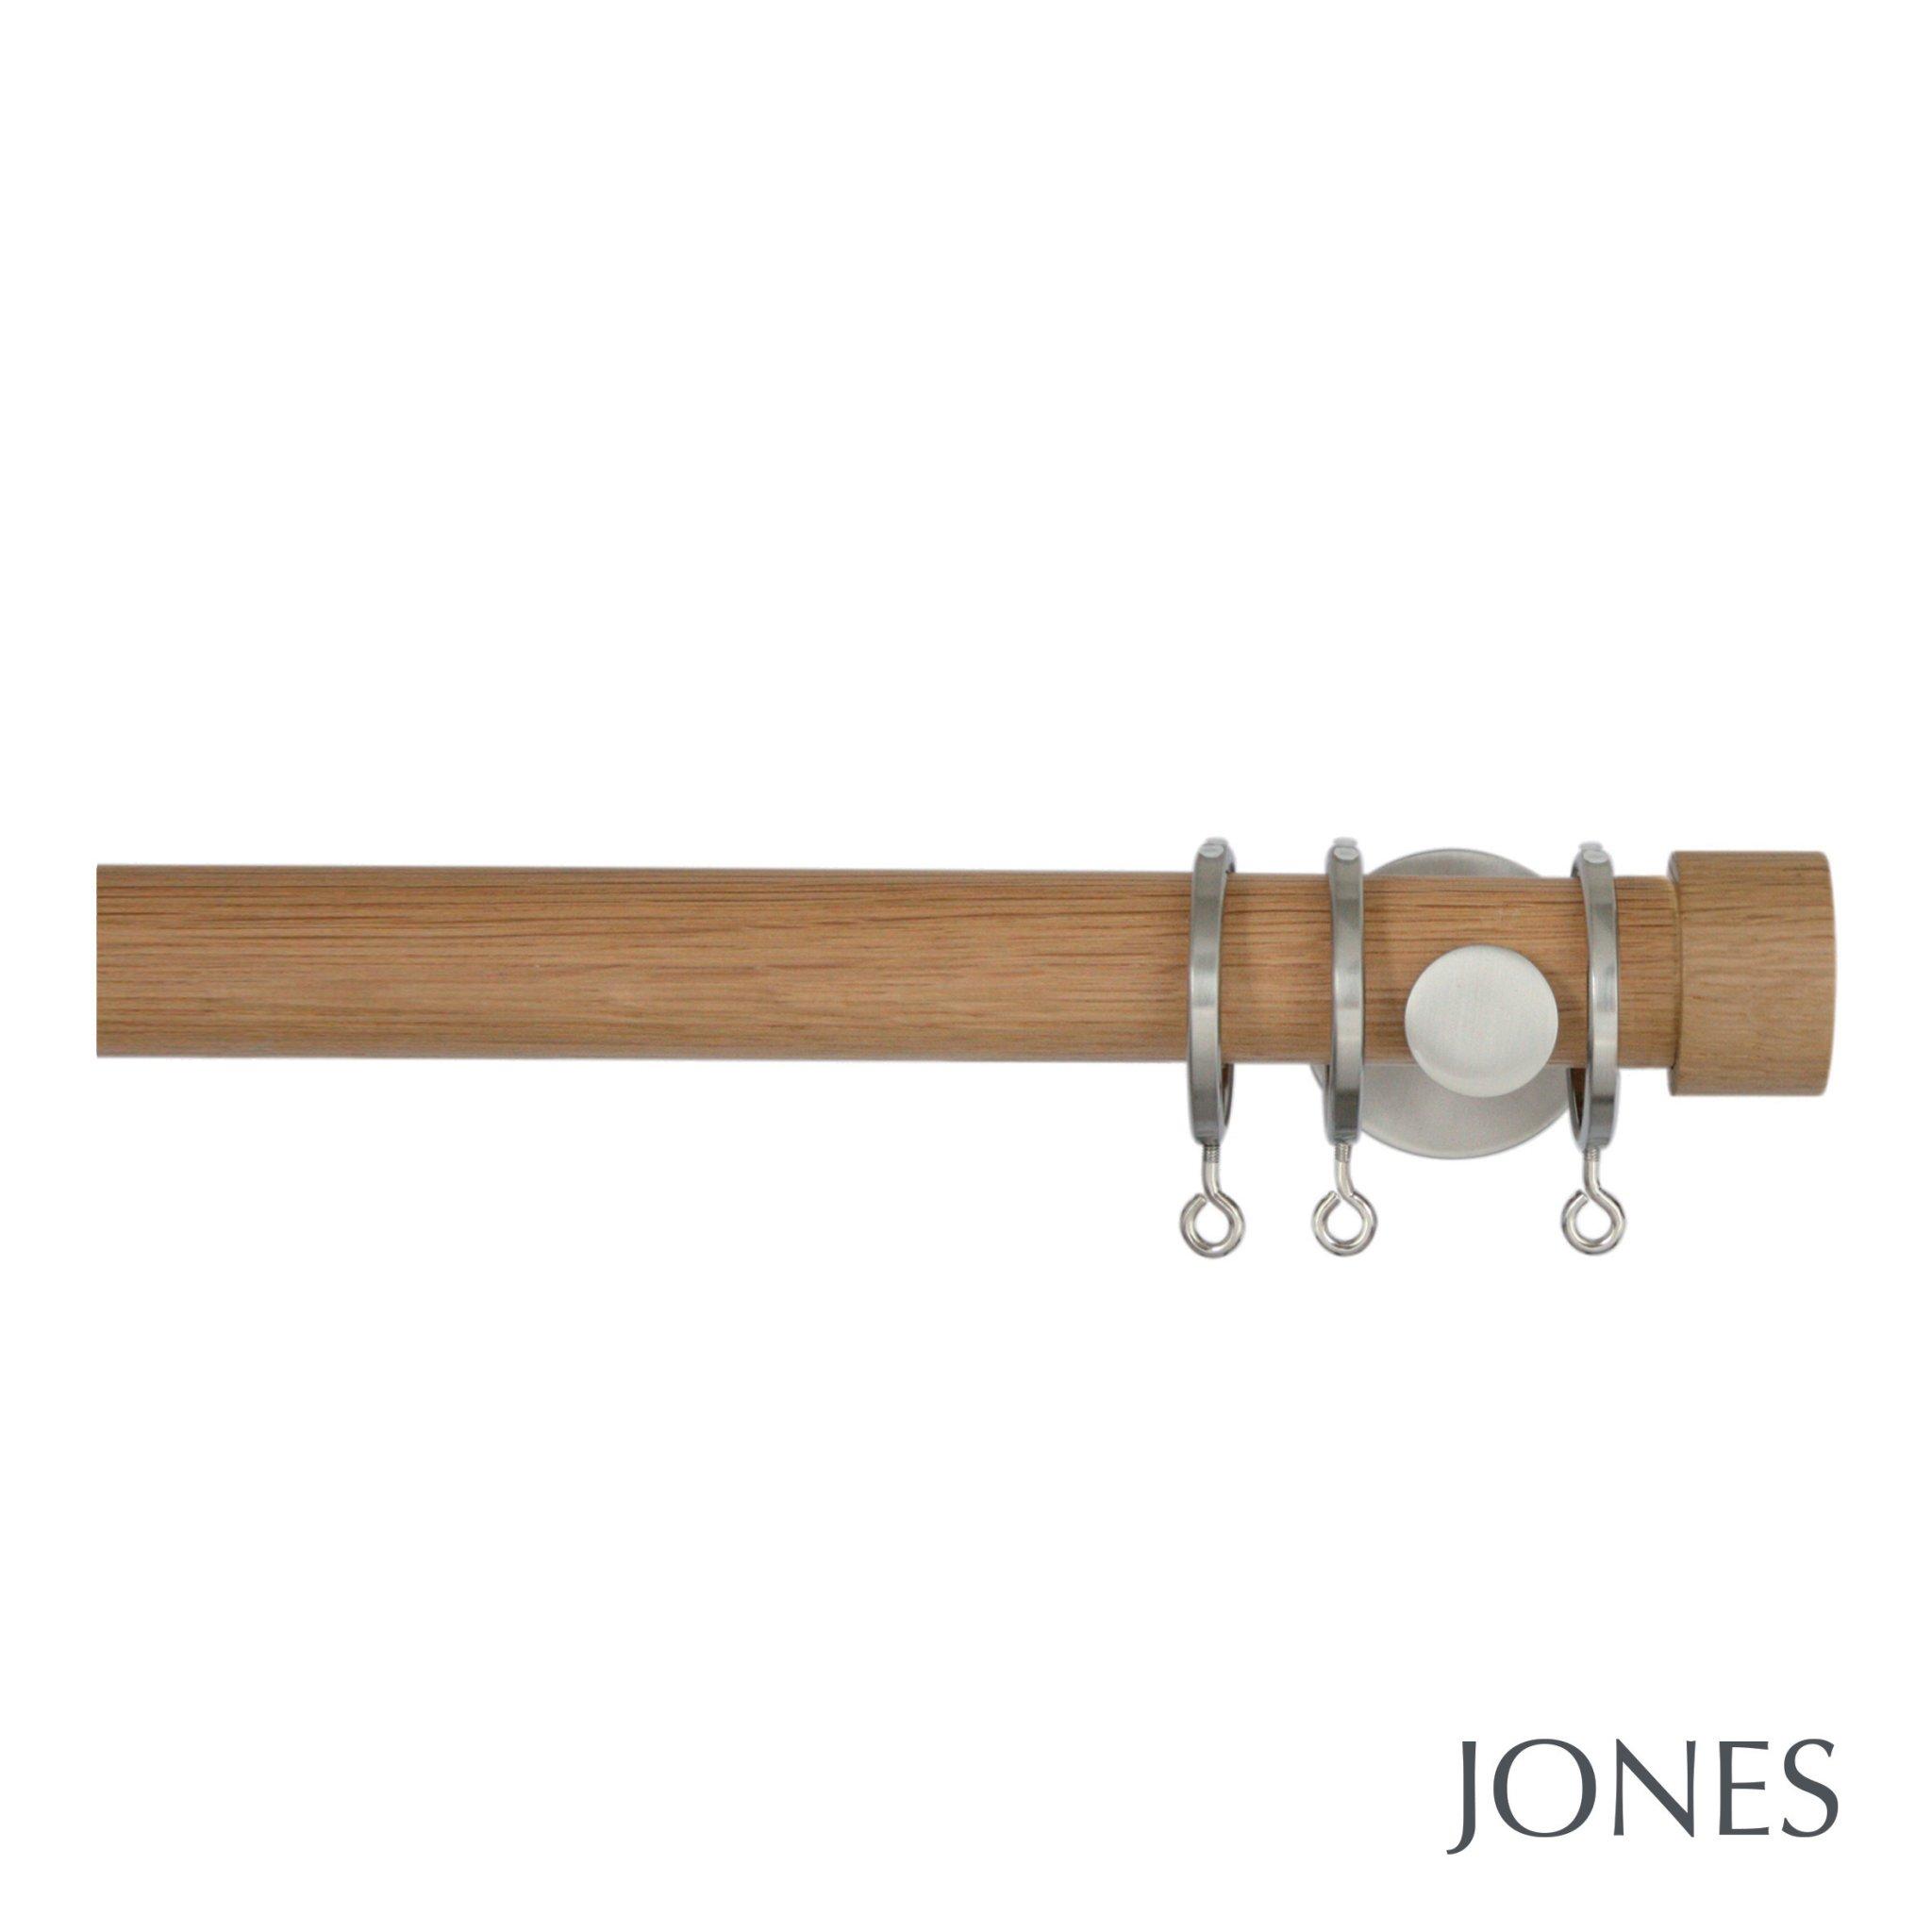 Jones Lunar 28mm Oak Curtain Pole With Oak End Cap Finials